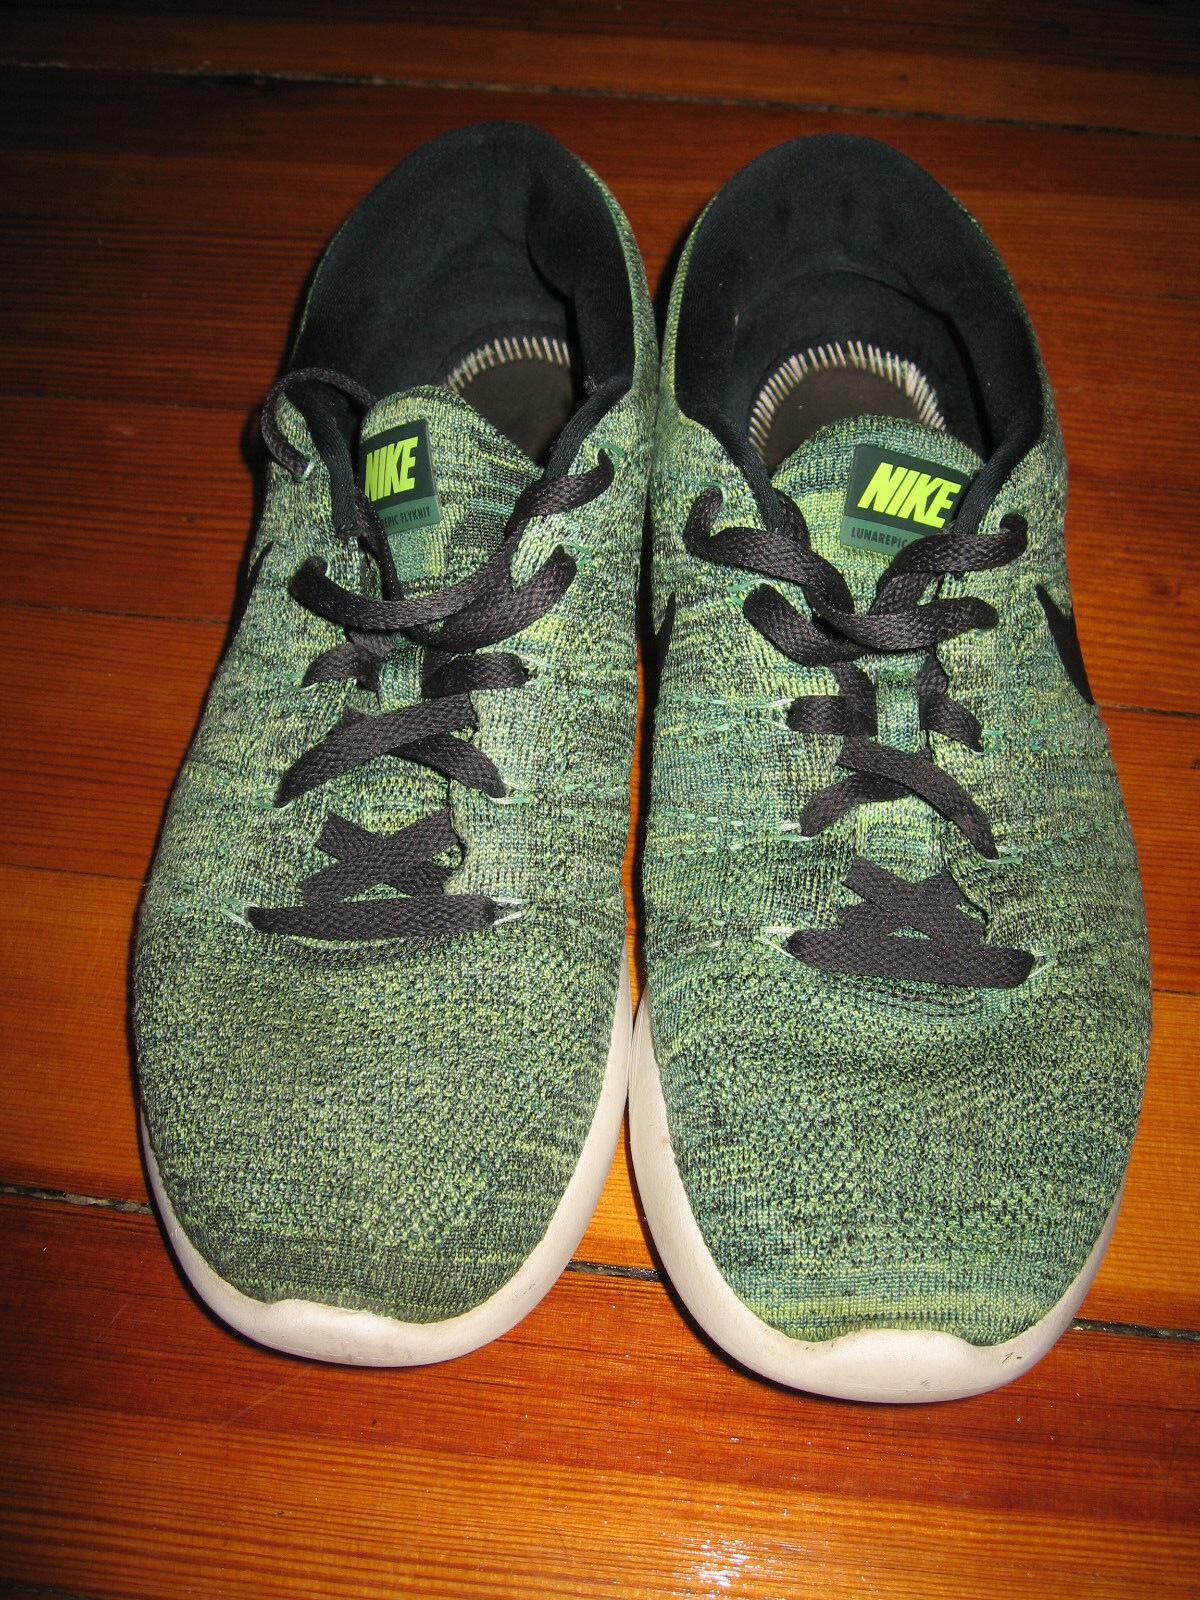 Usata lunarepic basso flyknit occasionale in scarpe da ginnastica nike scarpe taglia